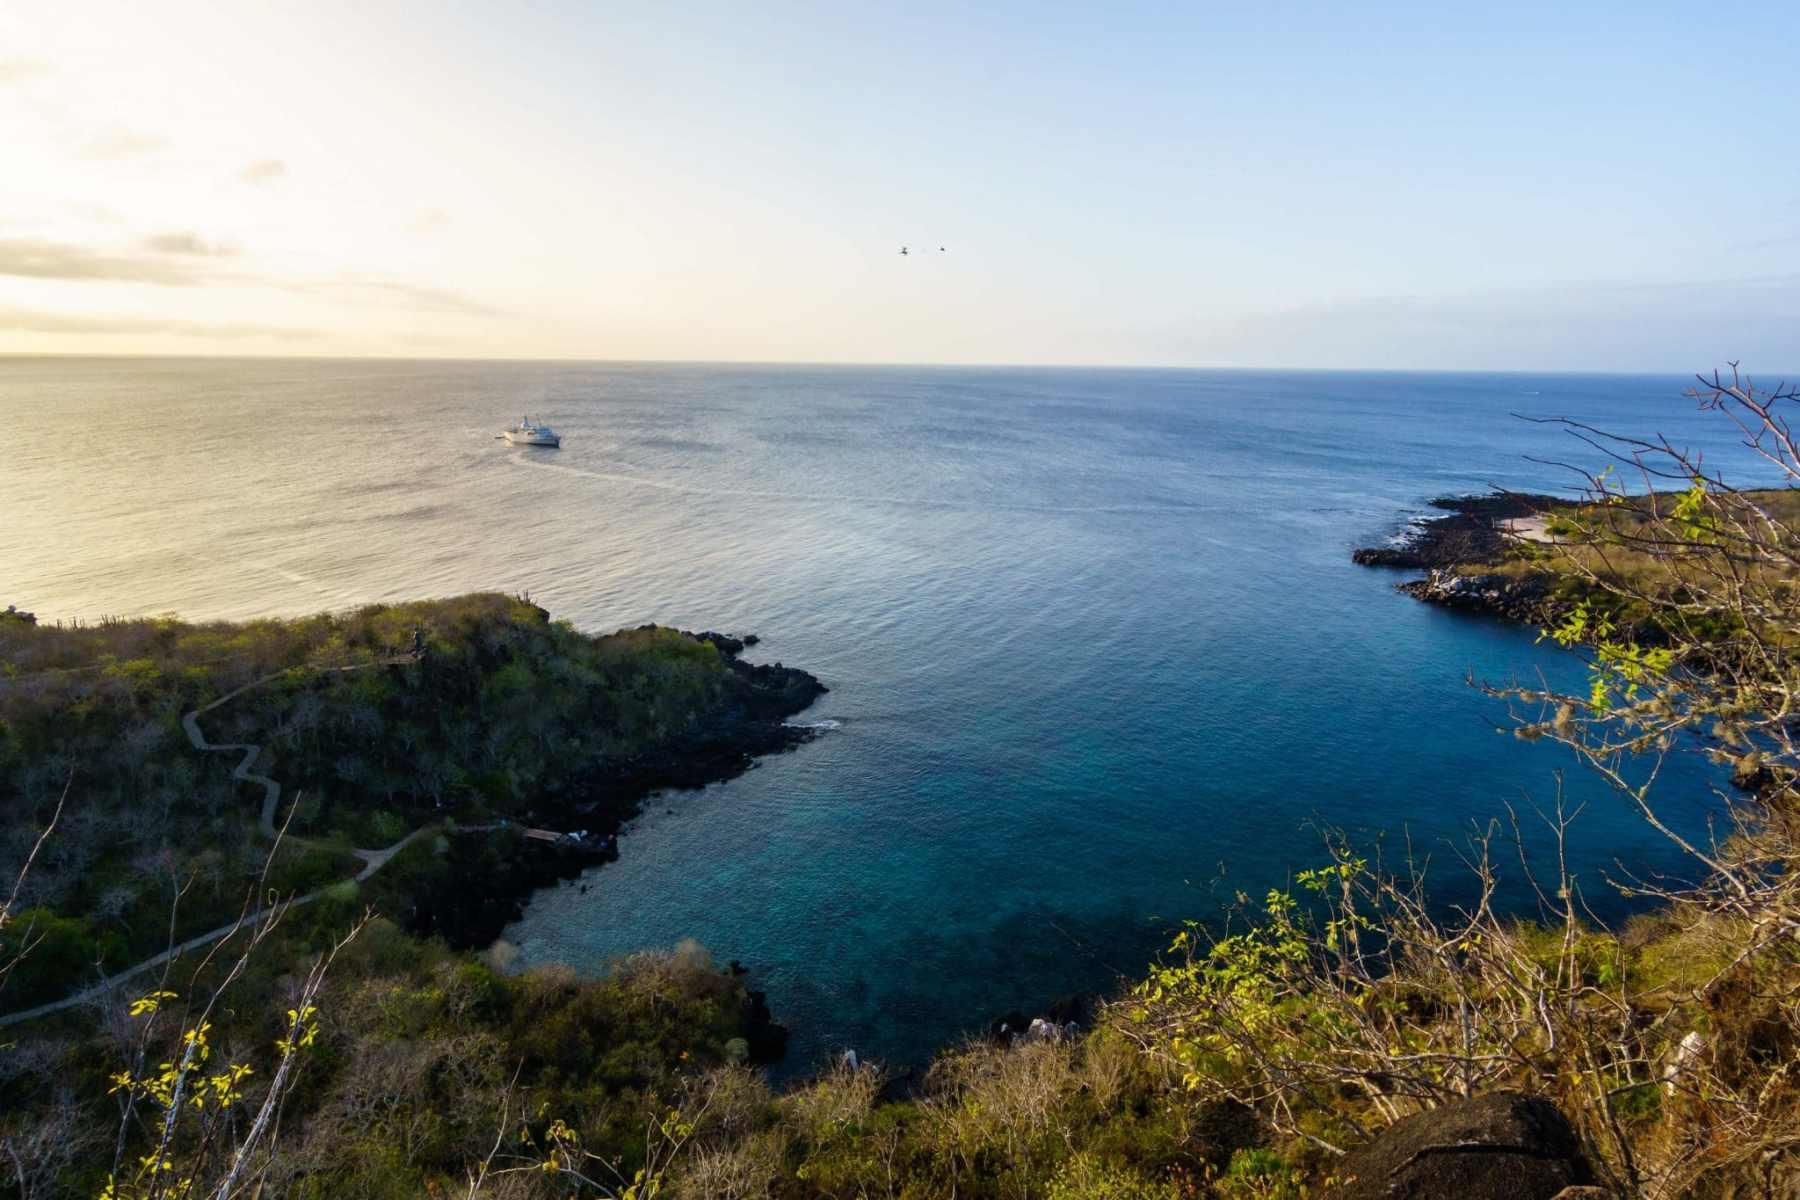 Cruise Boat Docked off Darwin's Cove